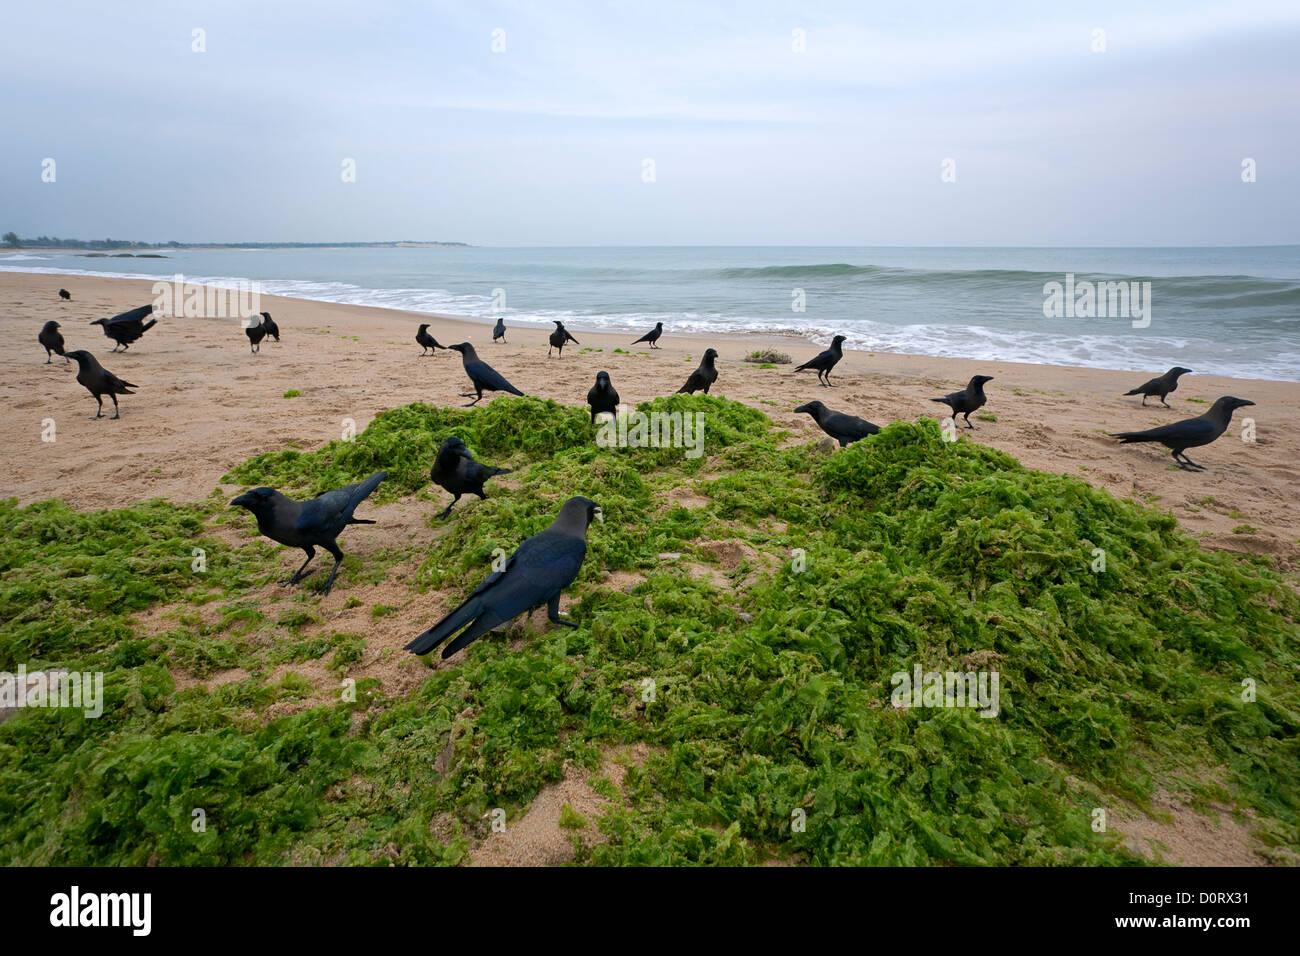 Krähen und Algen. Arugam Bay. Sri Lanka Stockbild